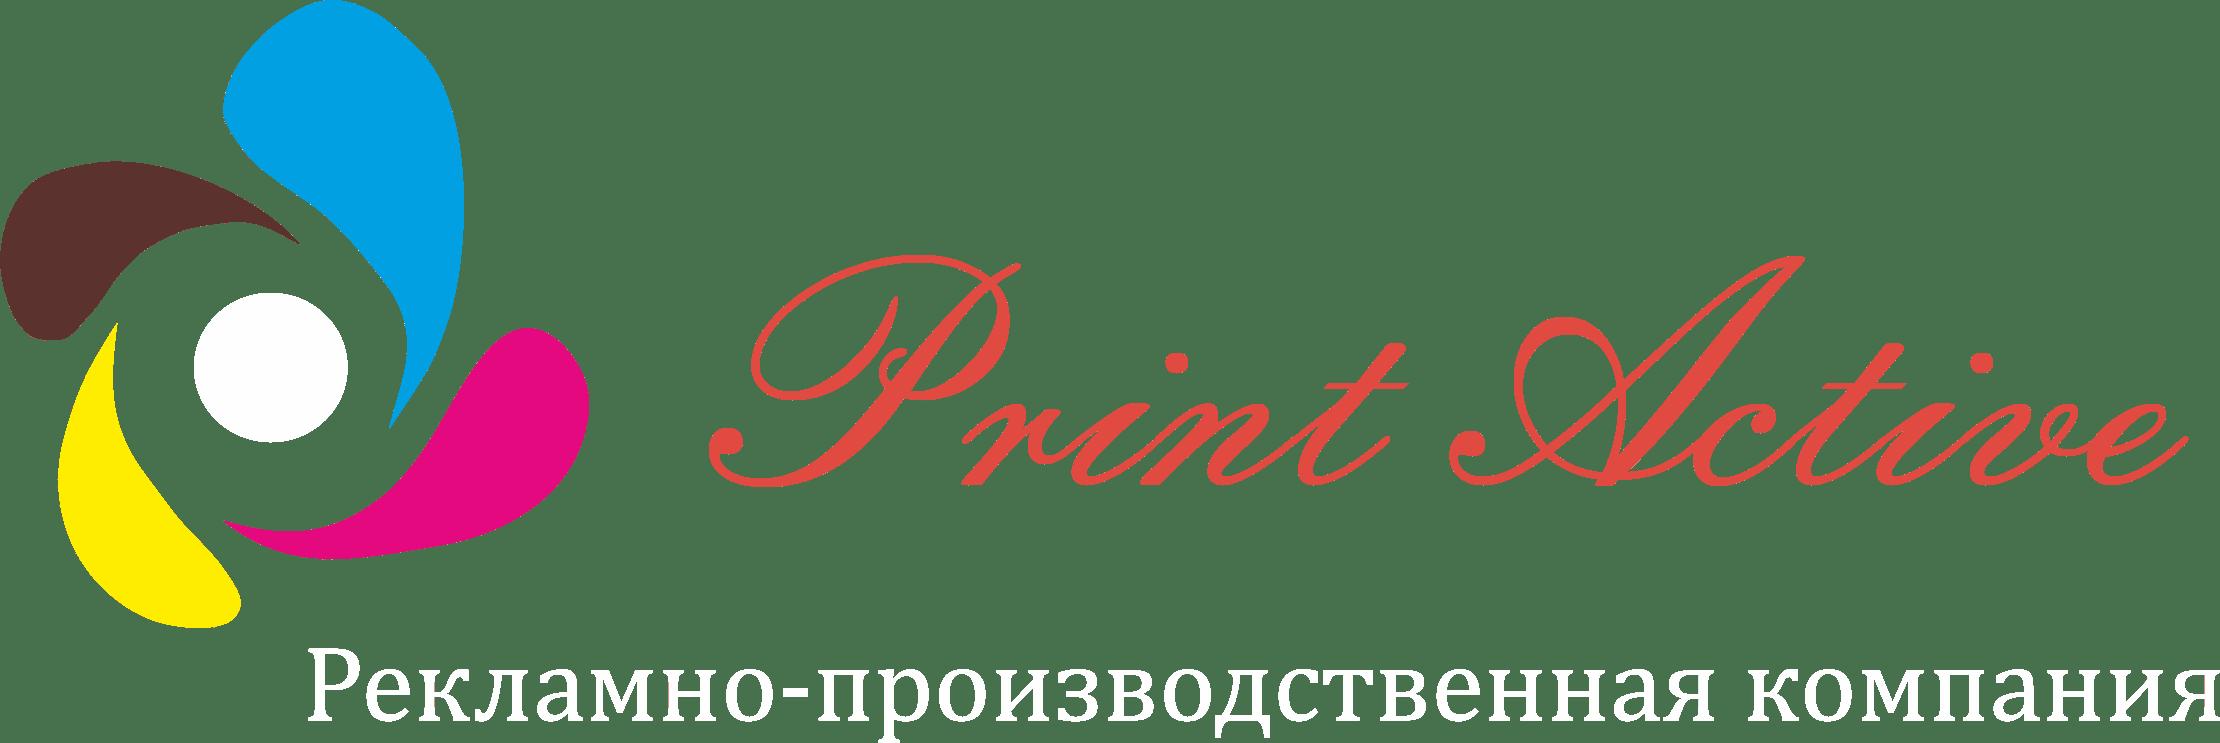 Картинки по запросу rpkactive.com.ua